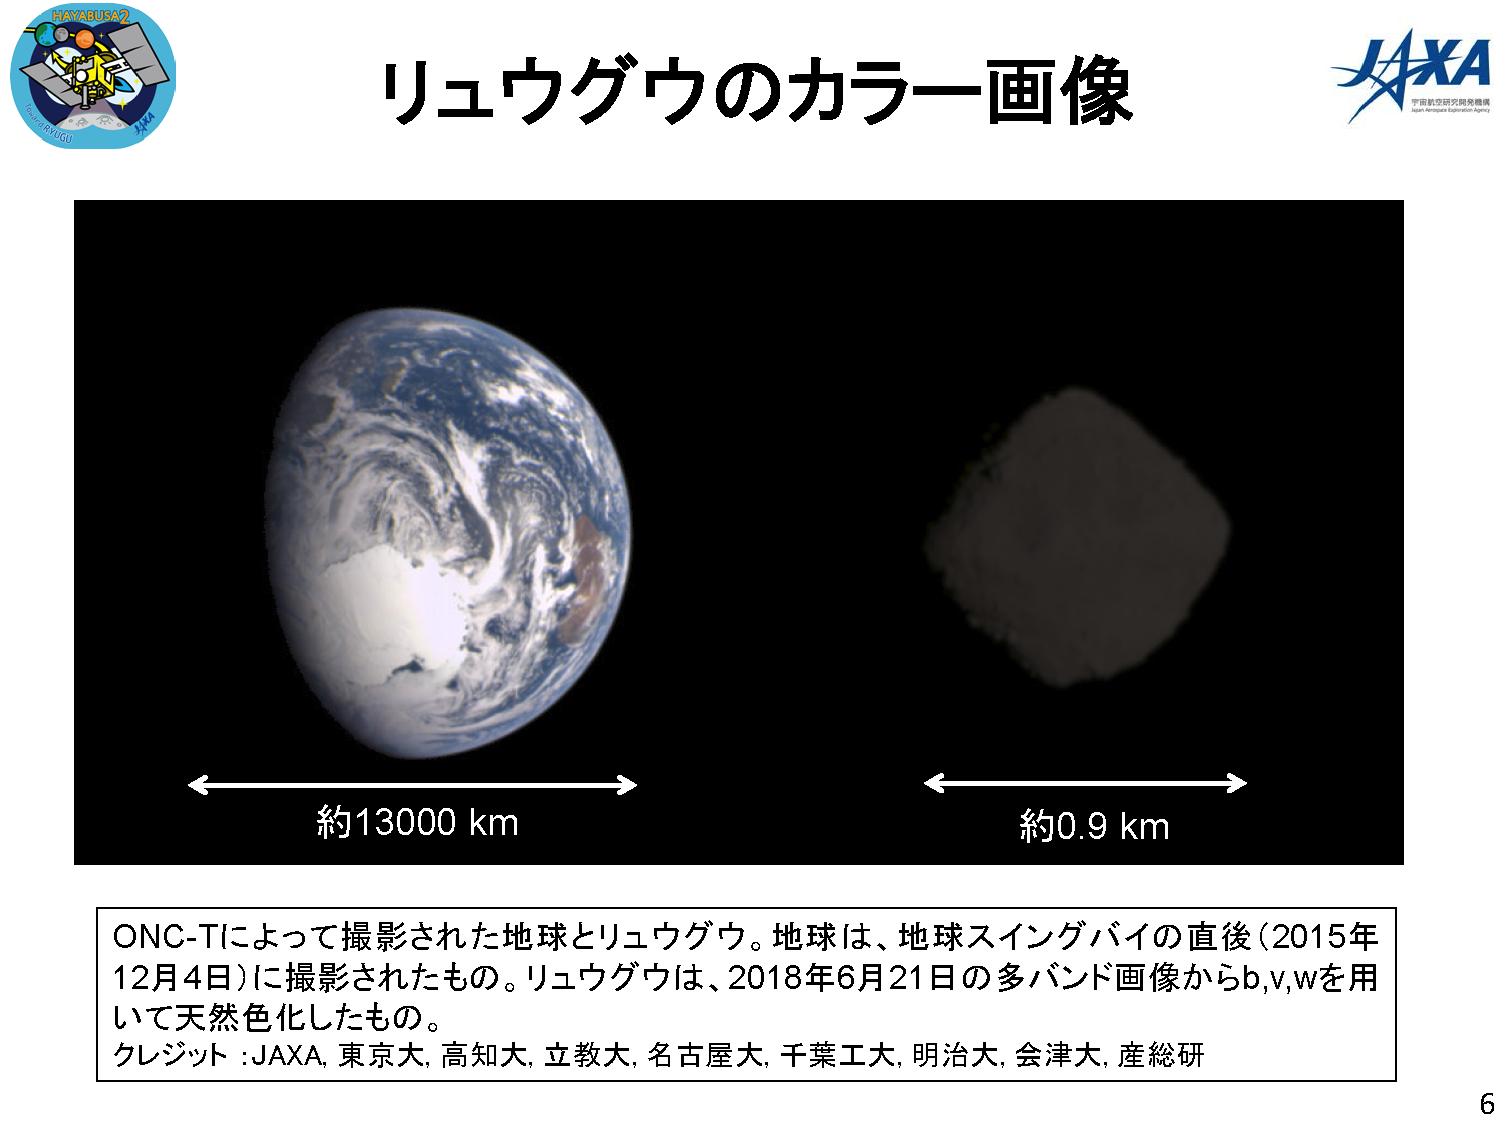 f:id:Imamura:20180627171835p:plain